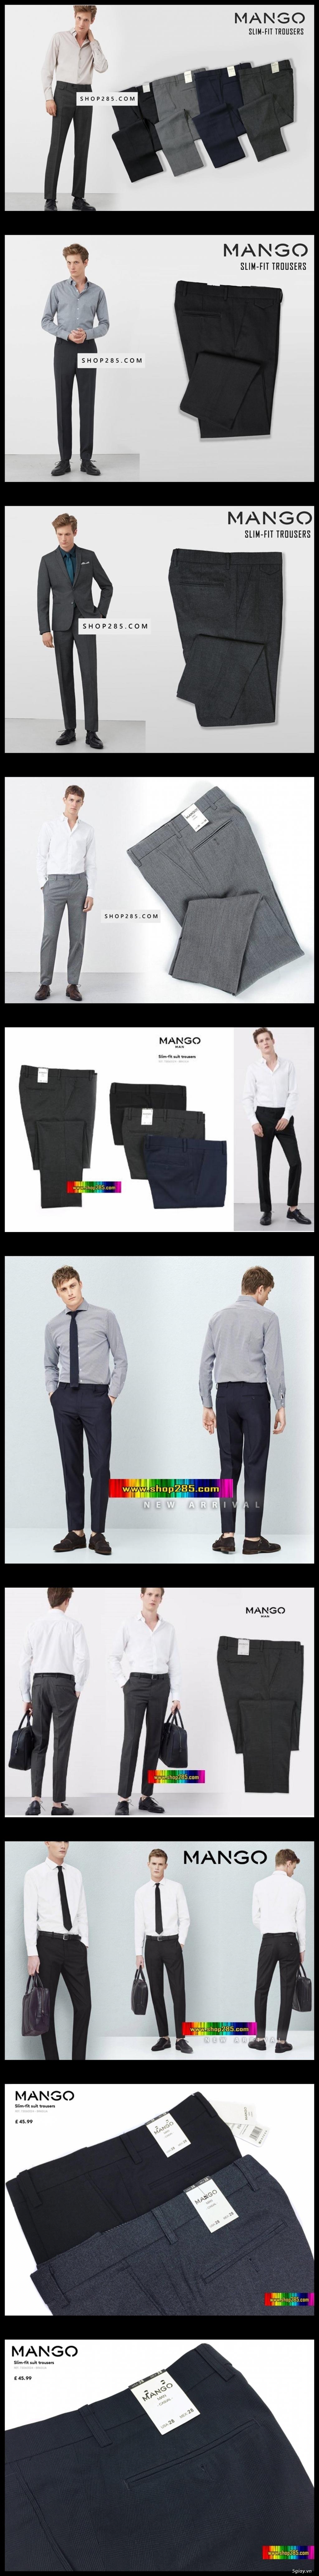 Shop285.com - Shop quần áo : Zara,Jules,Jake*s,,Hollister,Aber,CK,Tommy,Levis - 28